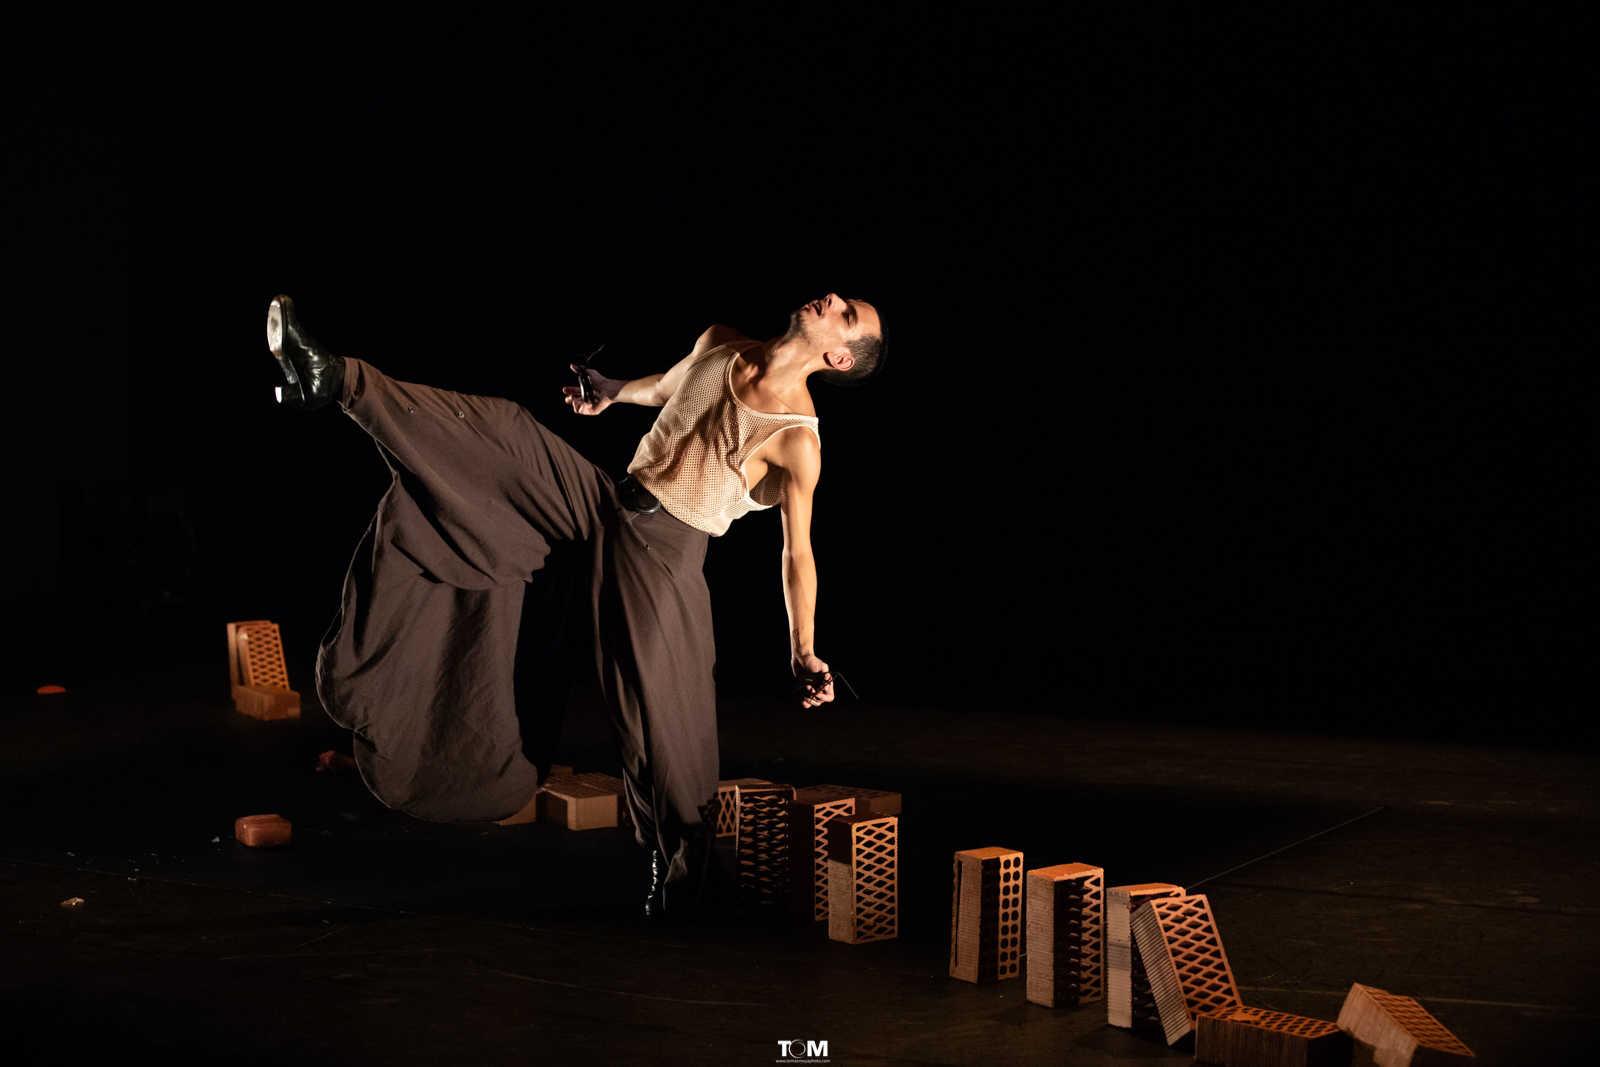 Oscilante. Danza flamenco contemporáneo